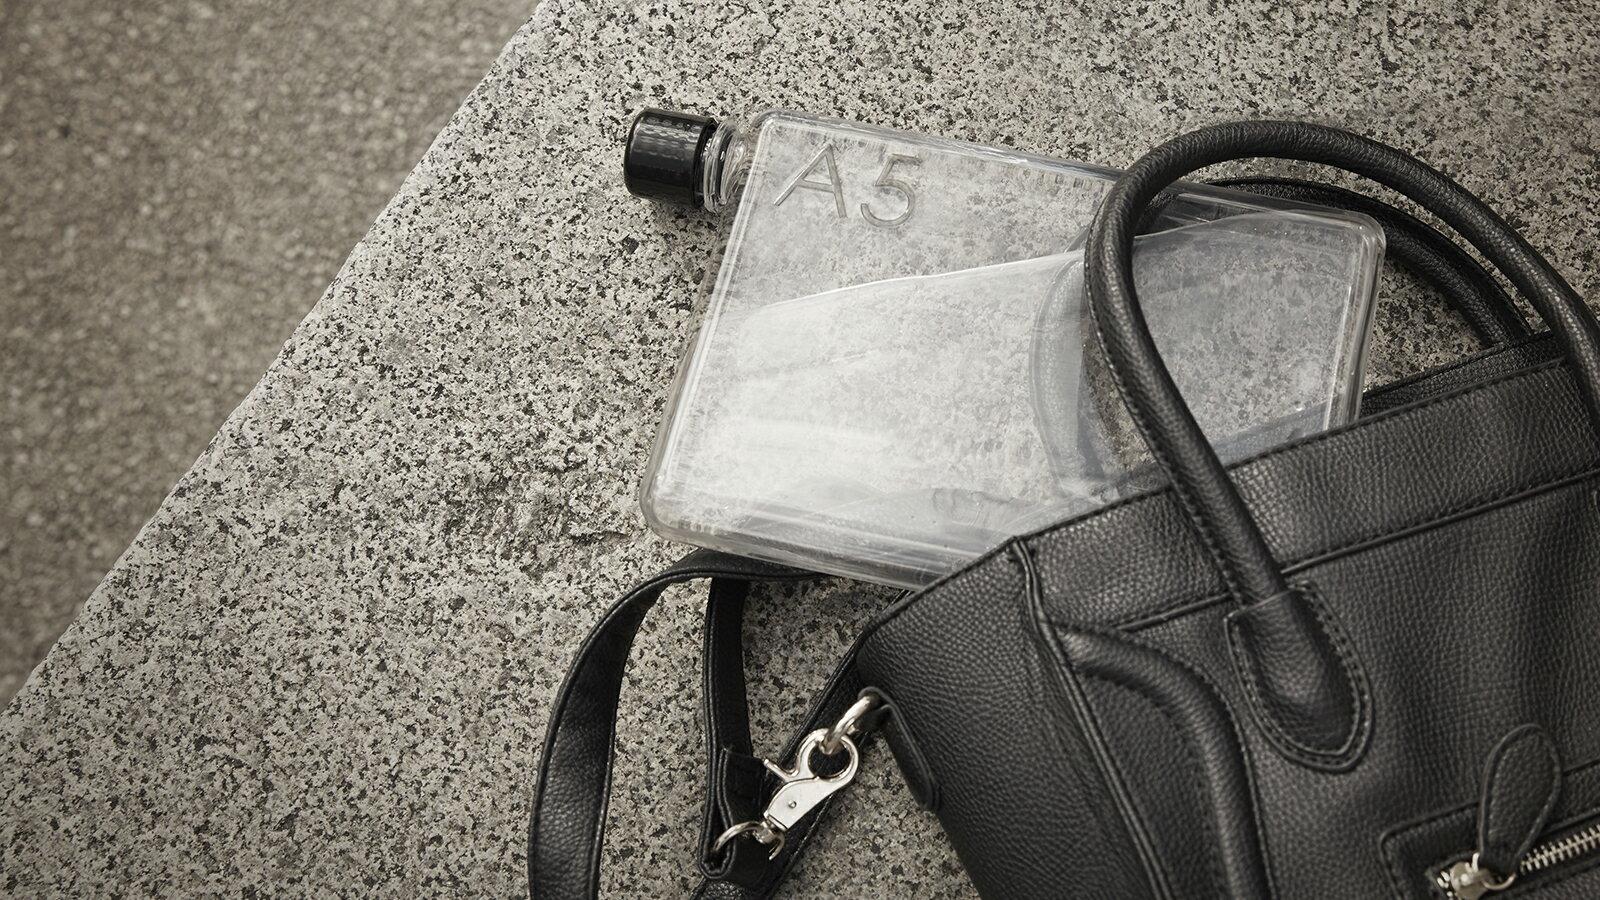 Memobottle A5 無毒環保旅行水壺 時尚水壺 澳洲設計 台灣製造 7